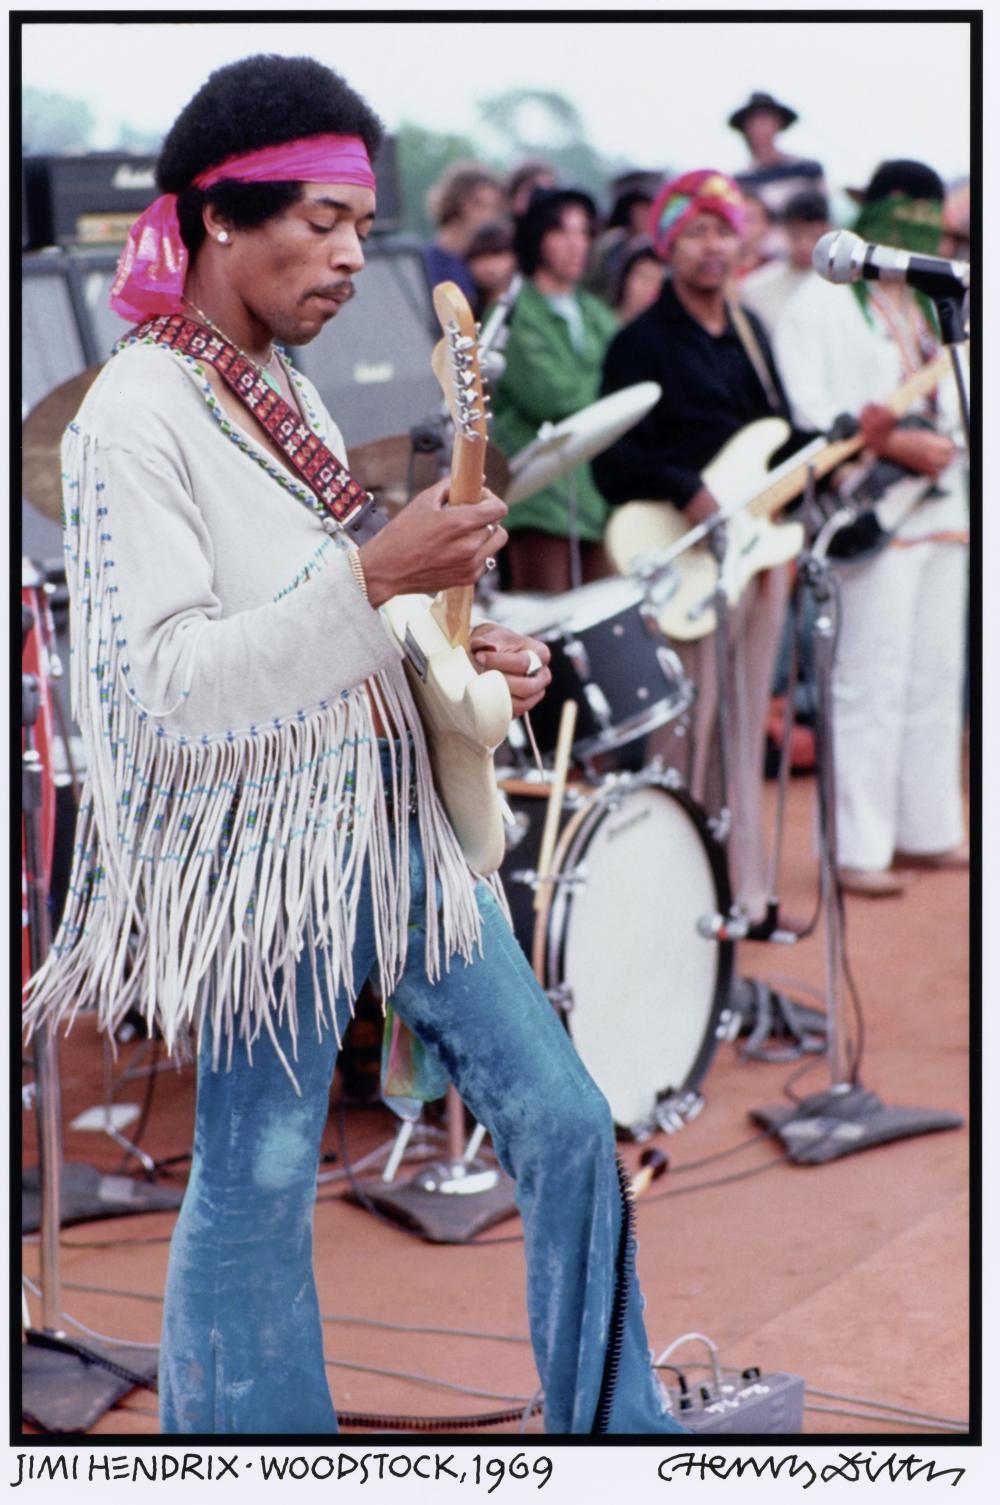 Jimi Hendrix: Photograph by Henry Diltz